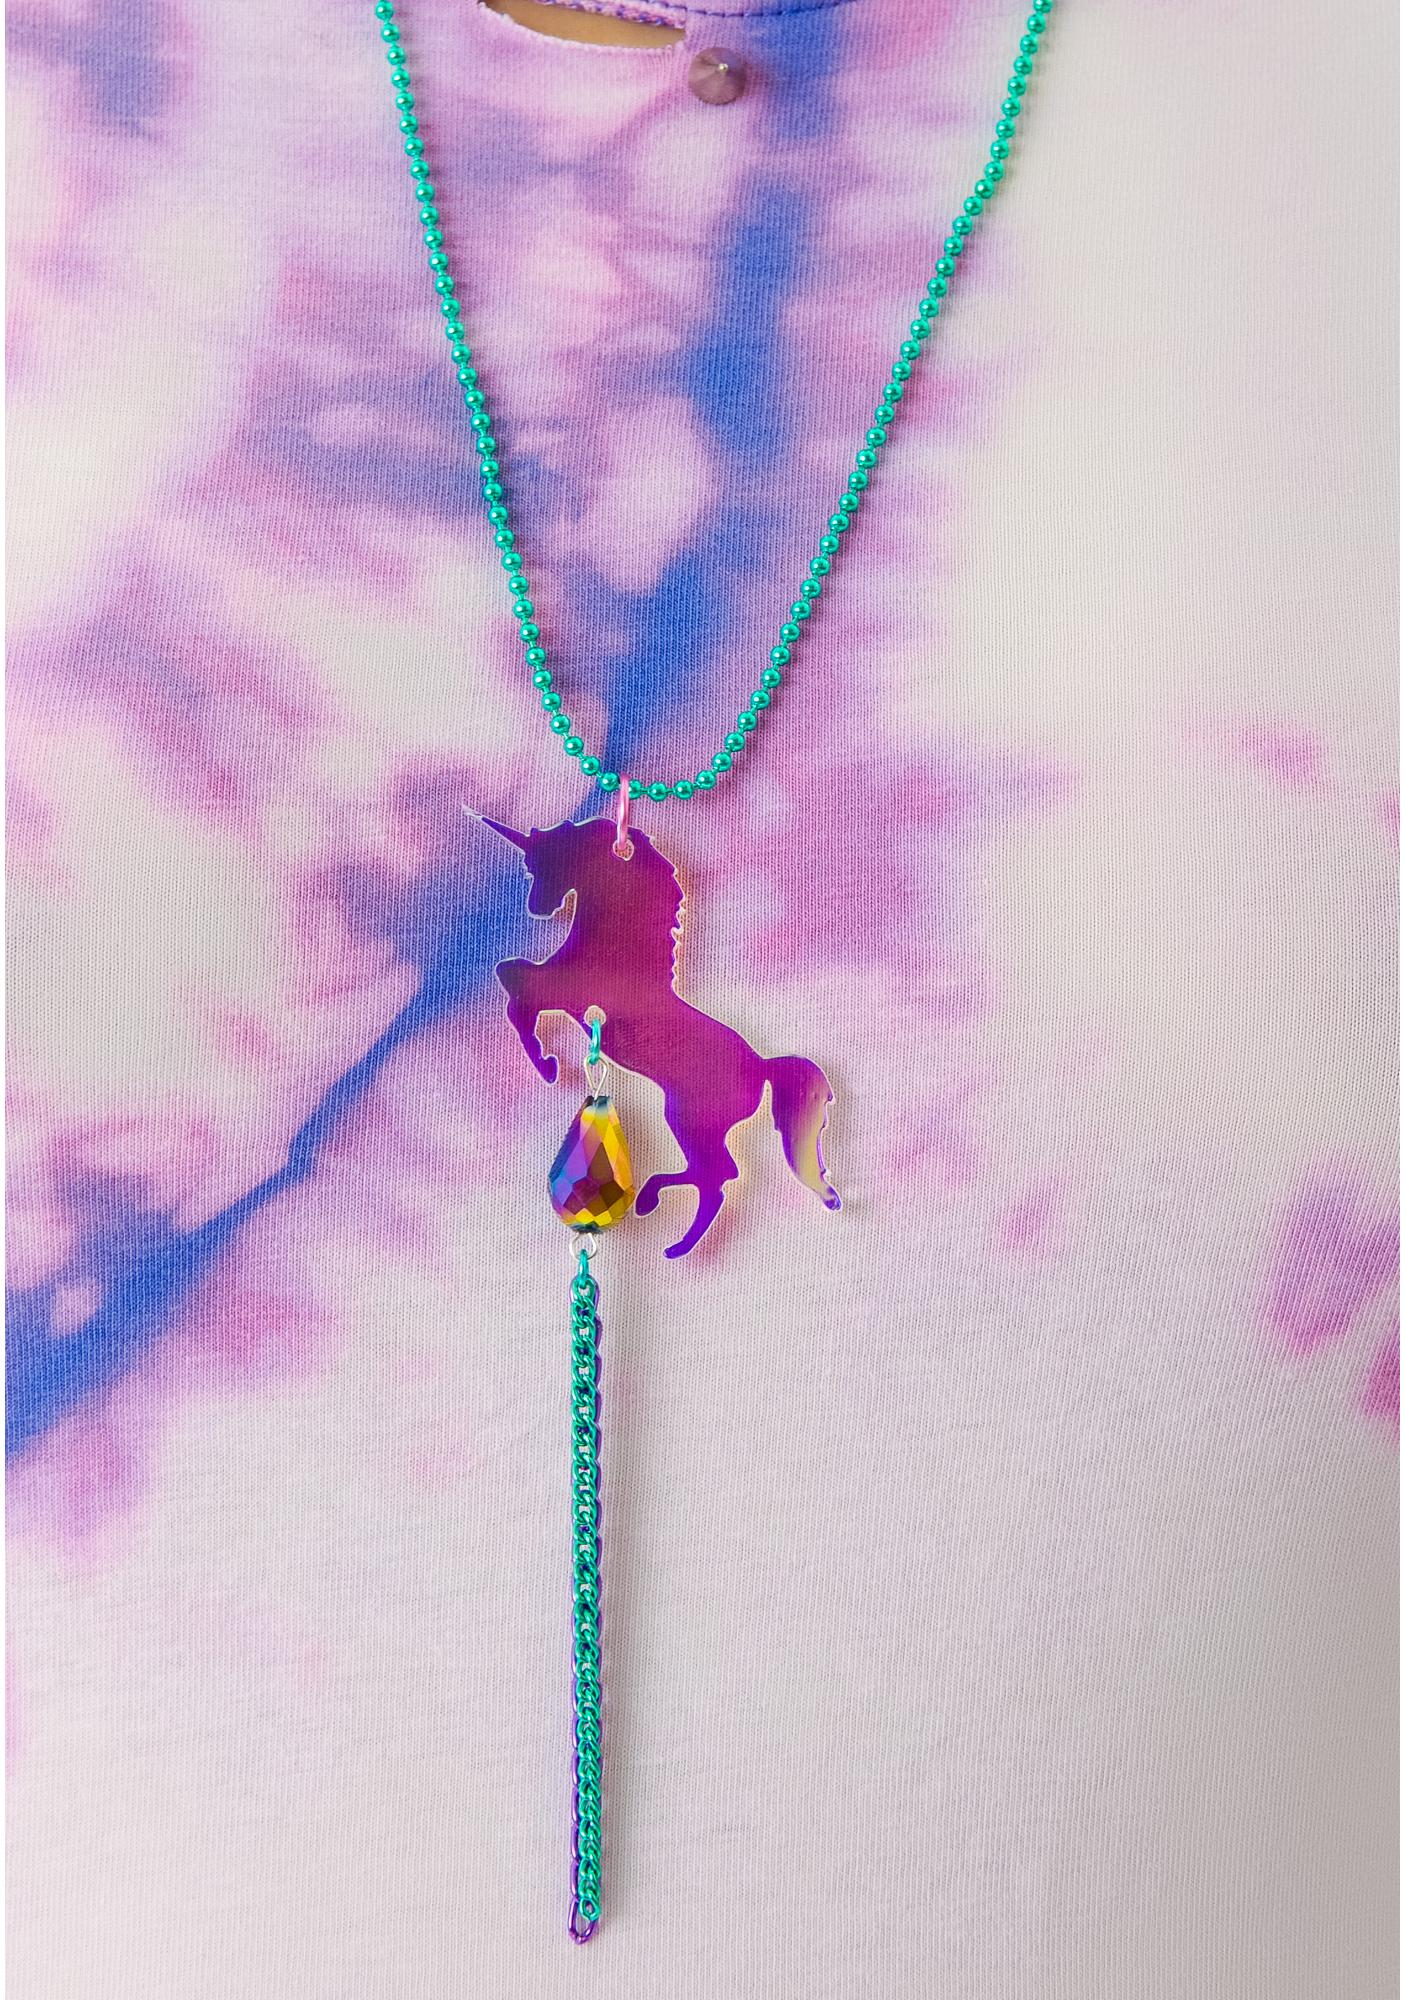 Suzywan Deluxe Unicorn Fantasma Iridescent Necklace